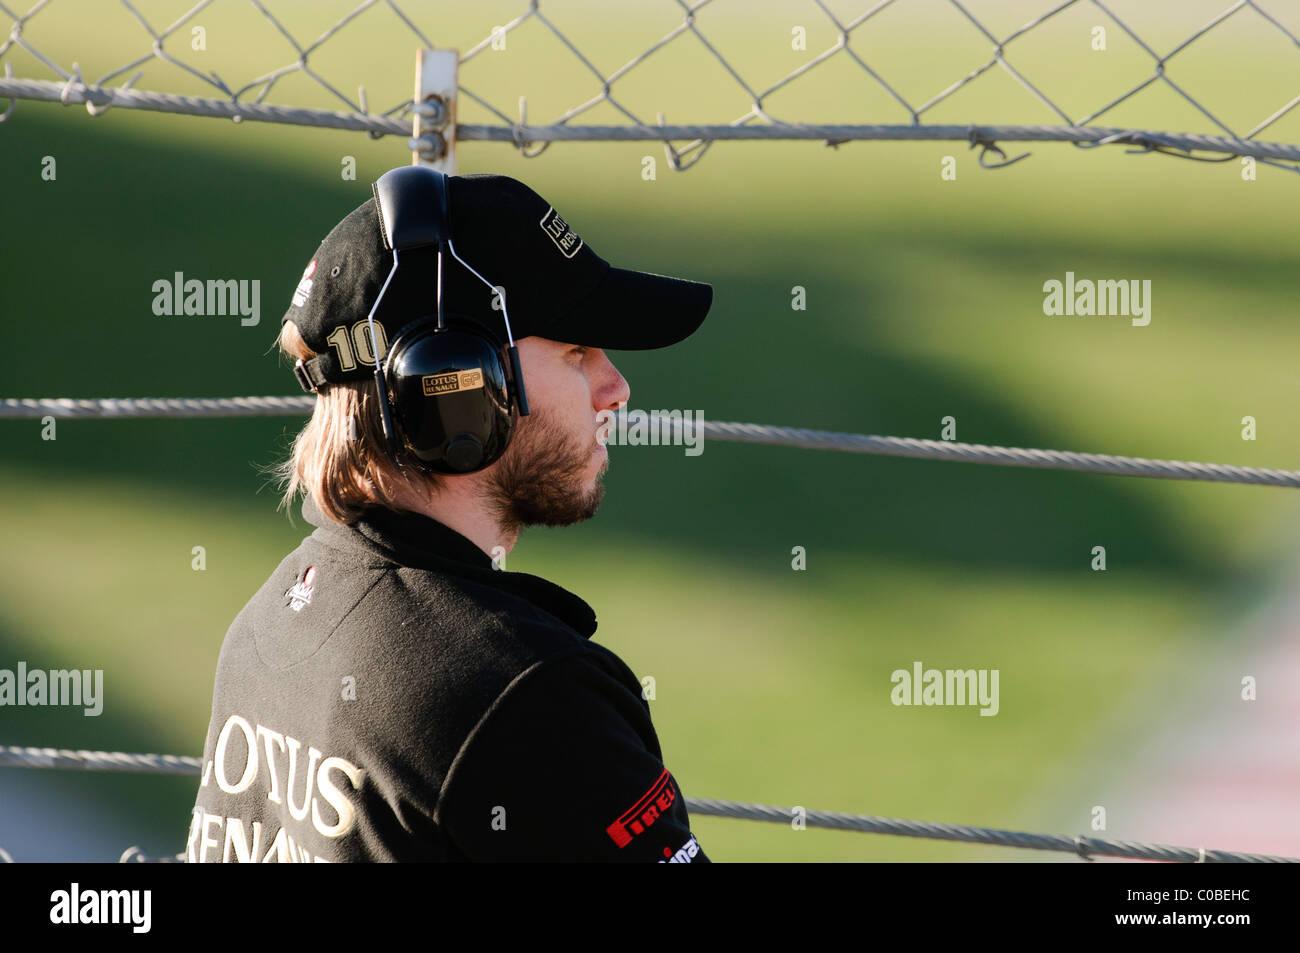 german Formula One driver Nick Heidfeld, Renault, February 2011 - Stock Image